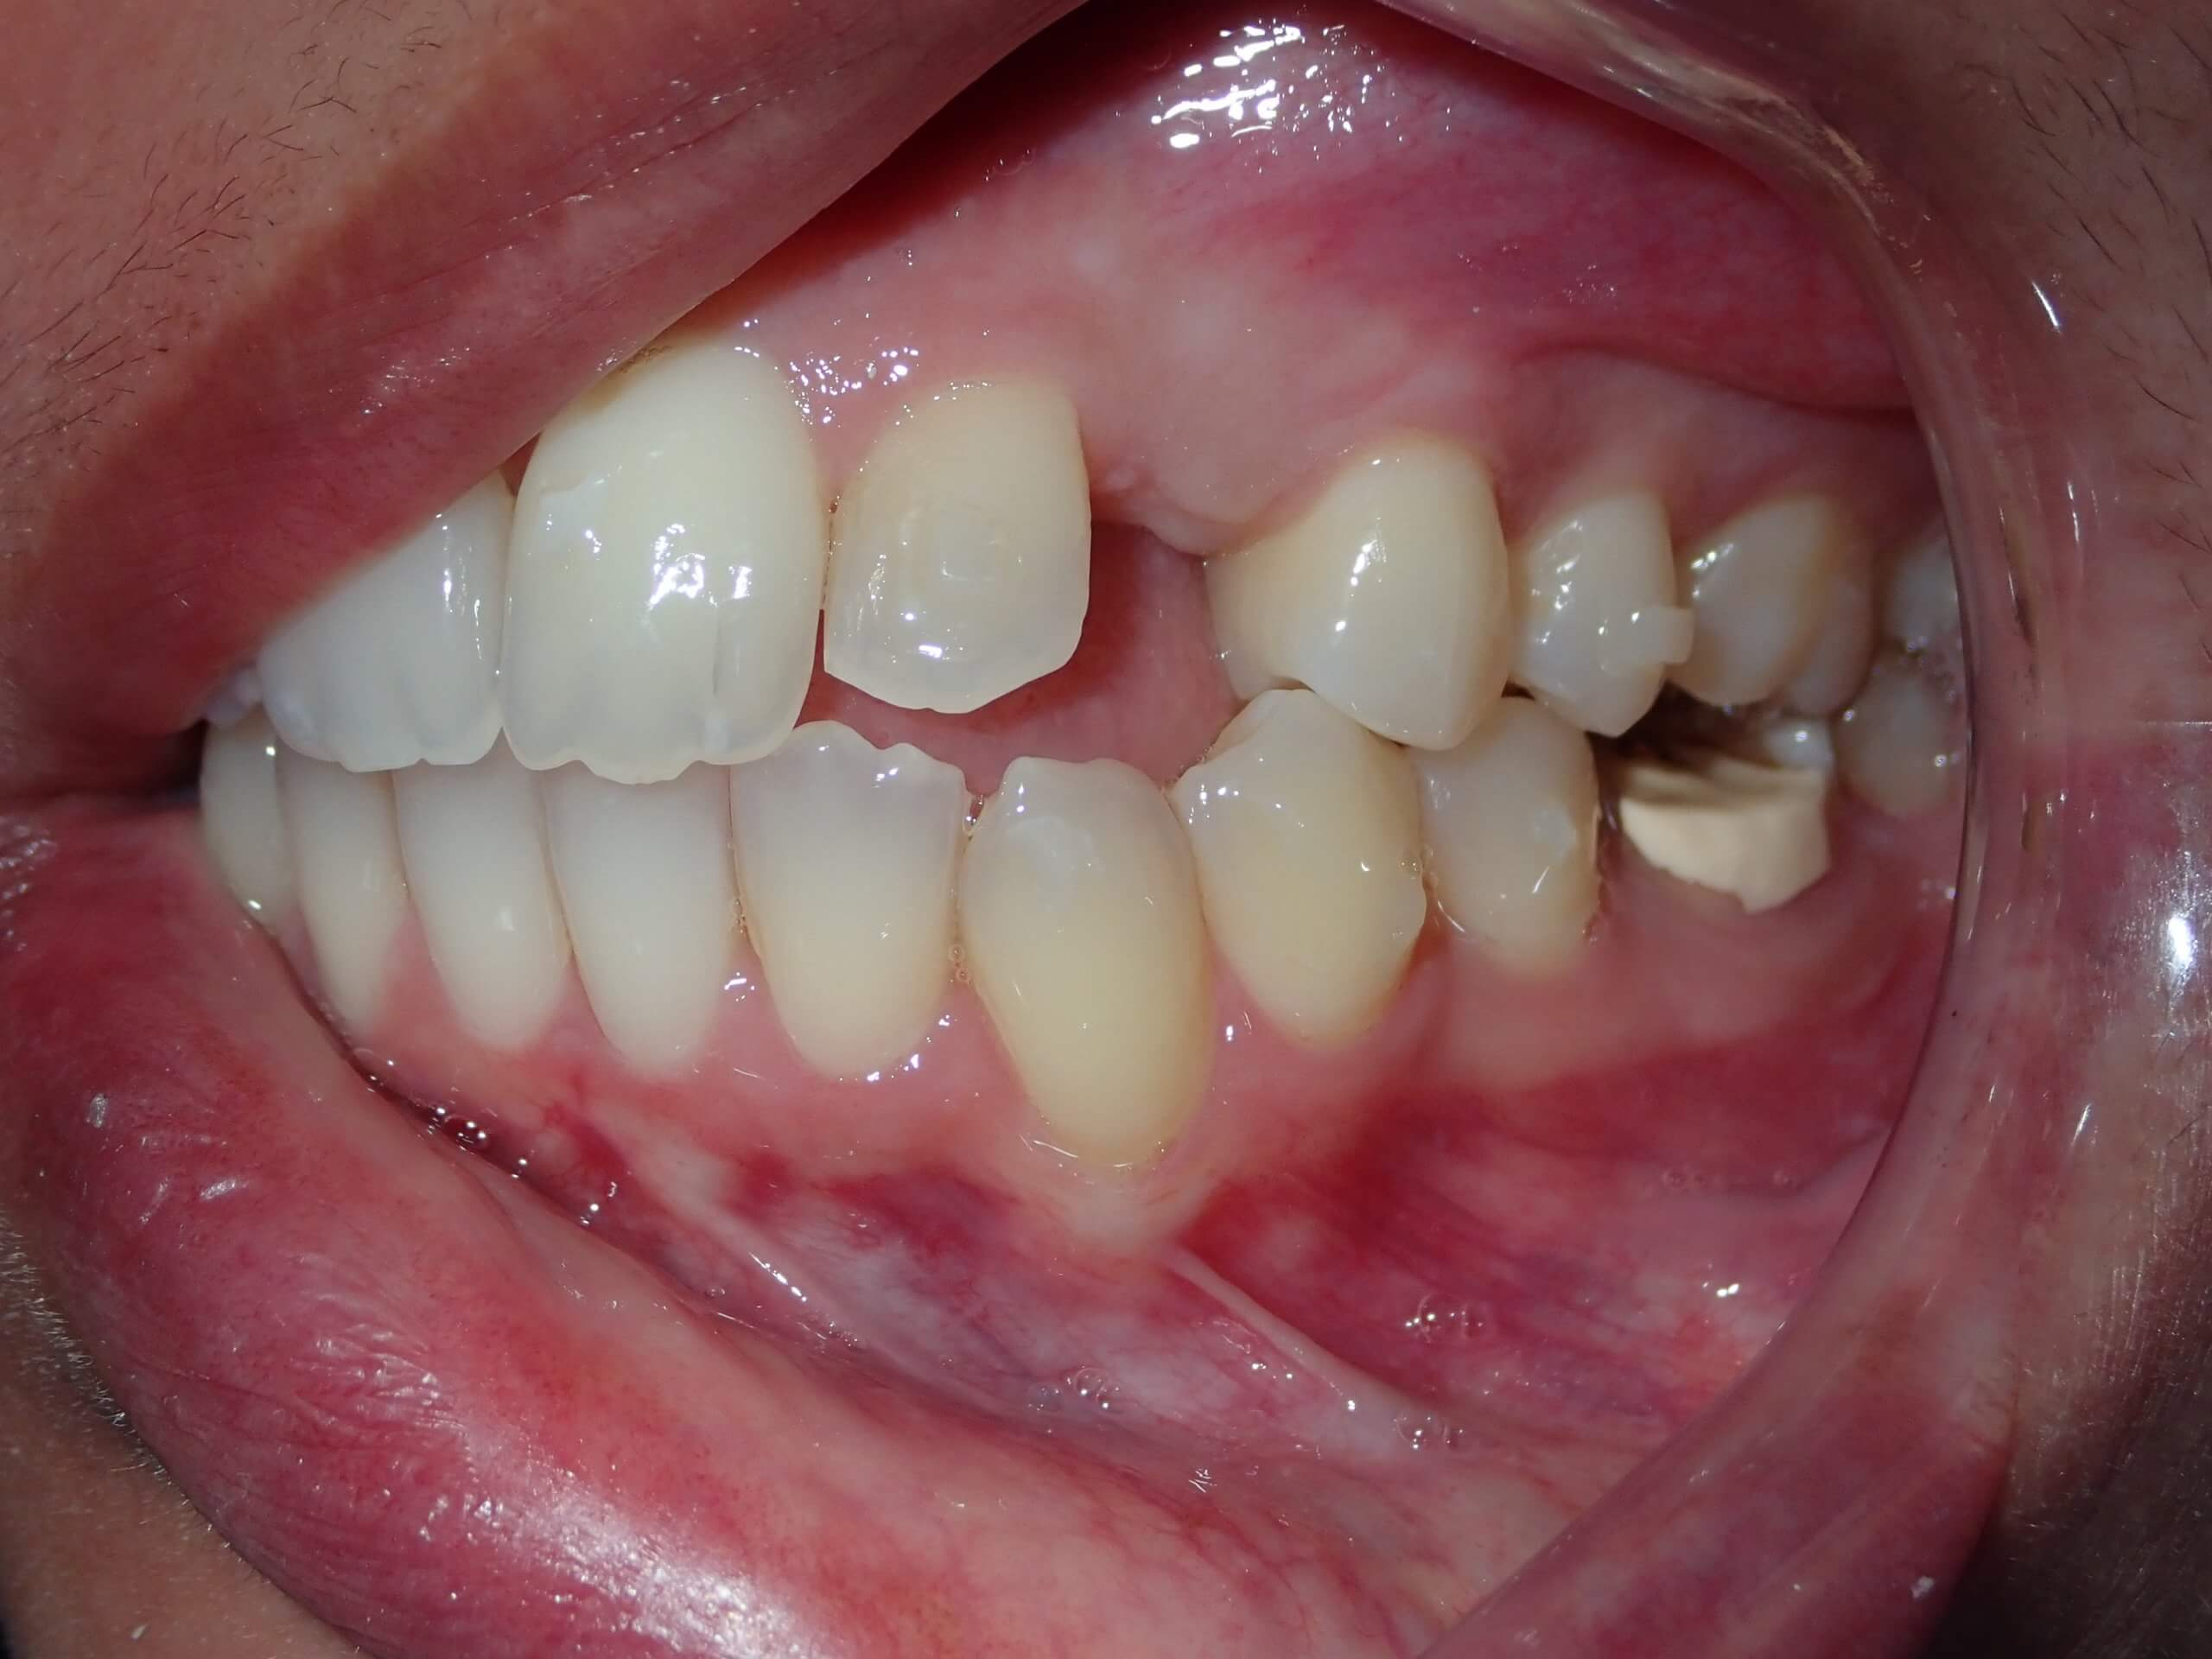 before dental implants 1